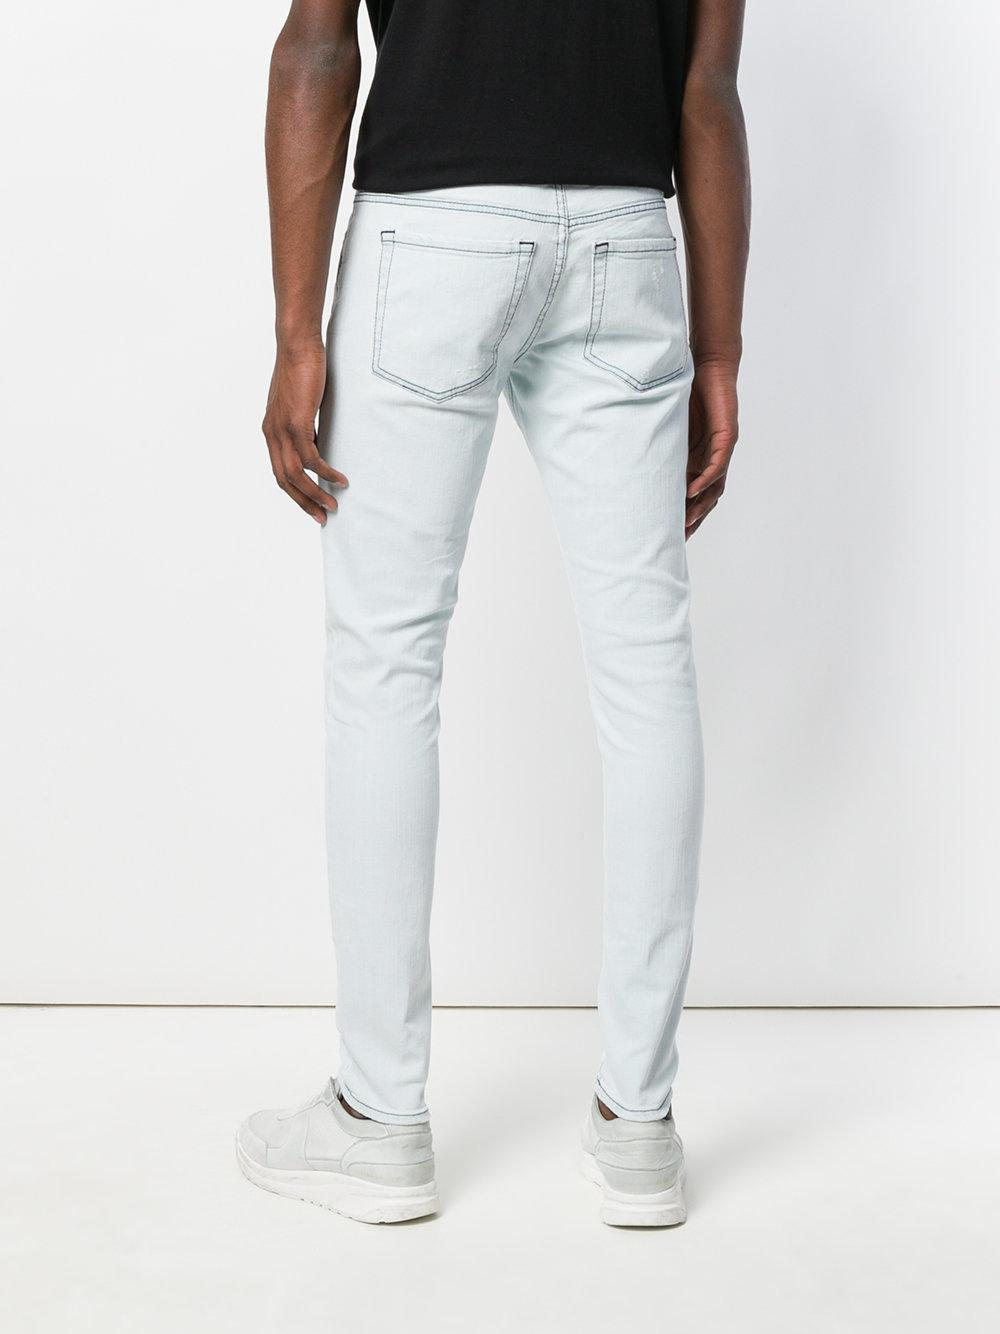 Represent Denim Jeans With Shoestring Belt in Blue for Men